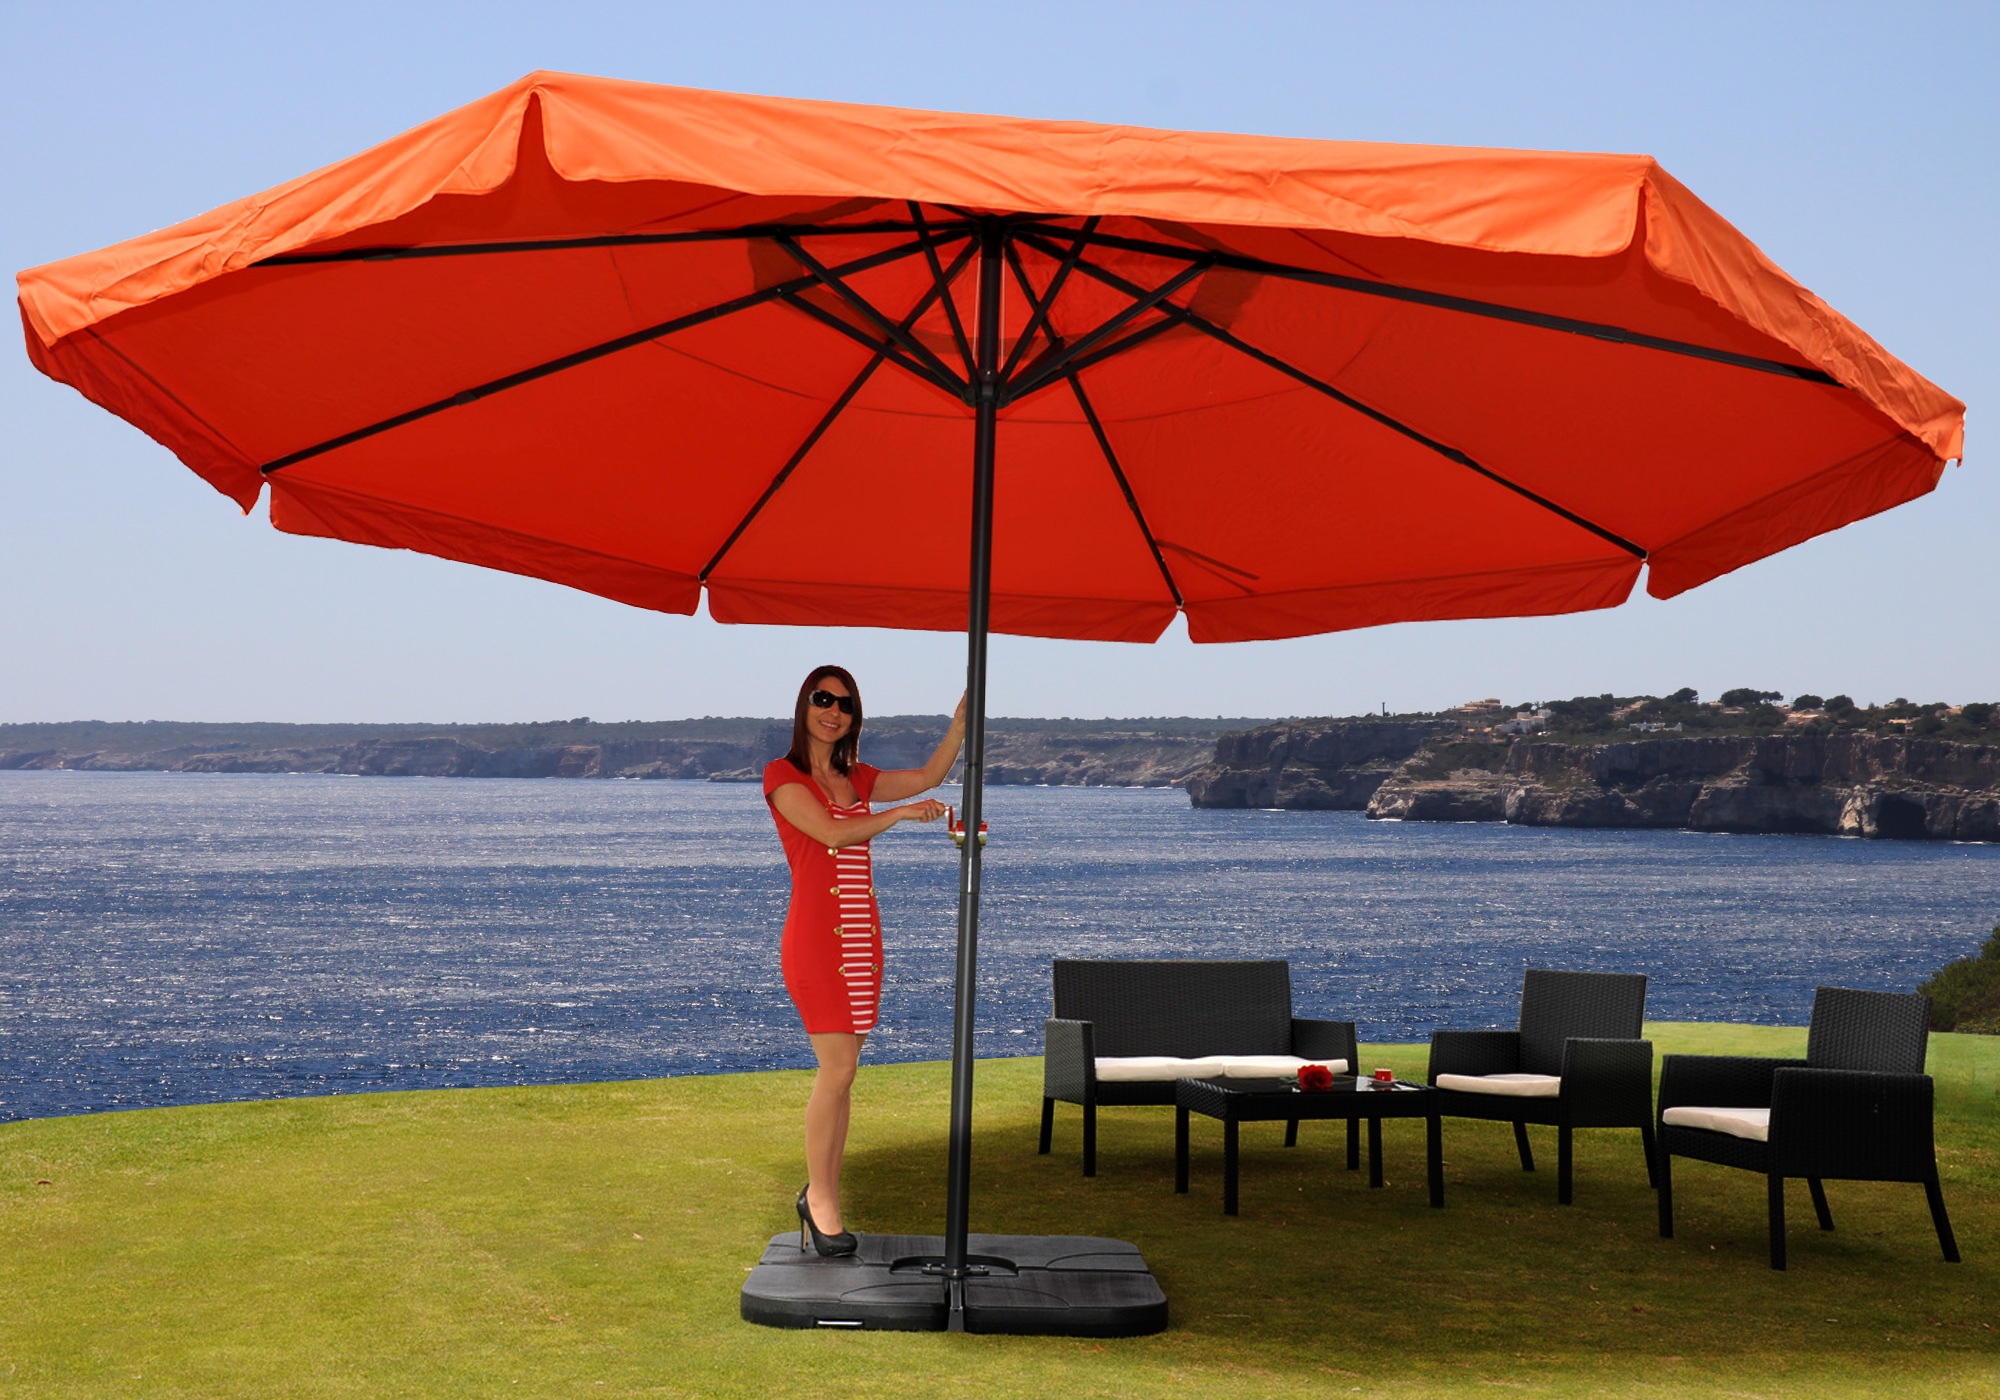 alu sonnenschirm gastronomie marktschirm gartenschirm meran 5m farbauswahl ebay. Black Bedroom Furniture Sets. Home Design Ideas